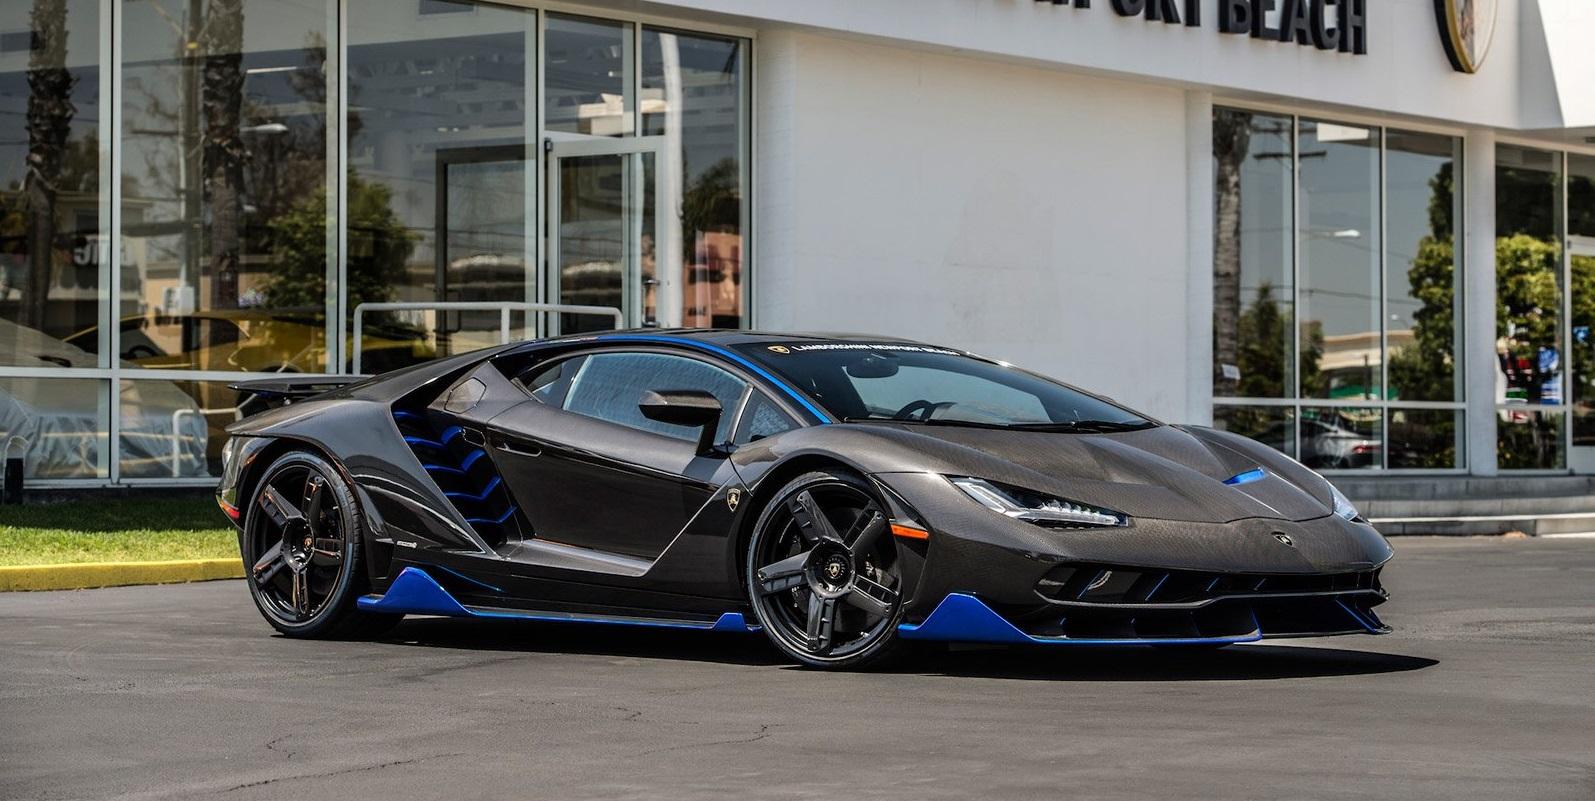 The First Lamborghini Centenario In The Us Has Arrived Vwvortex